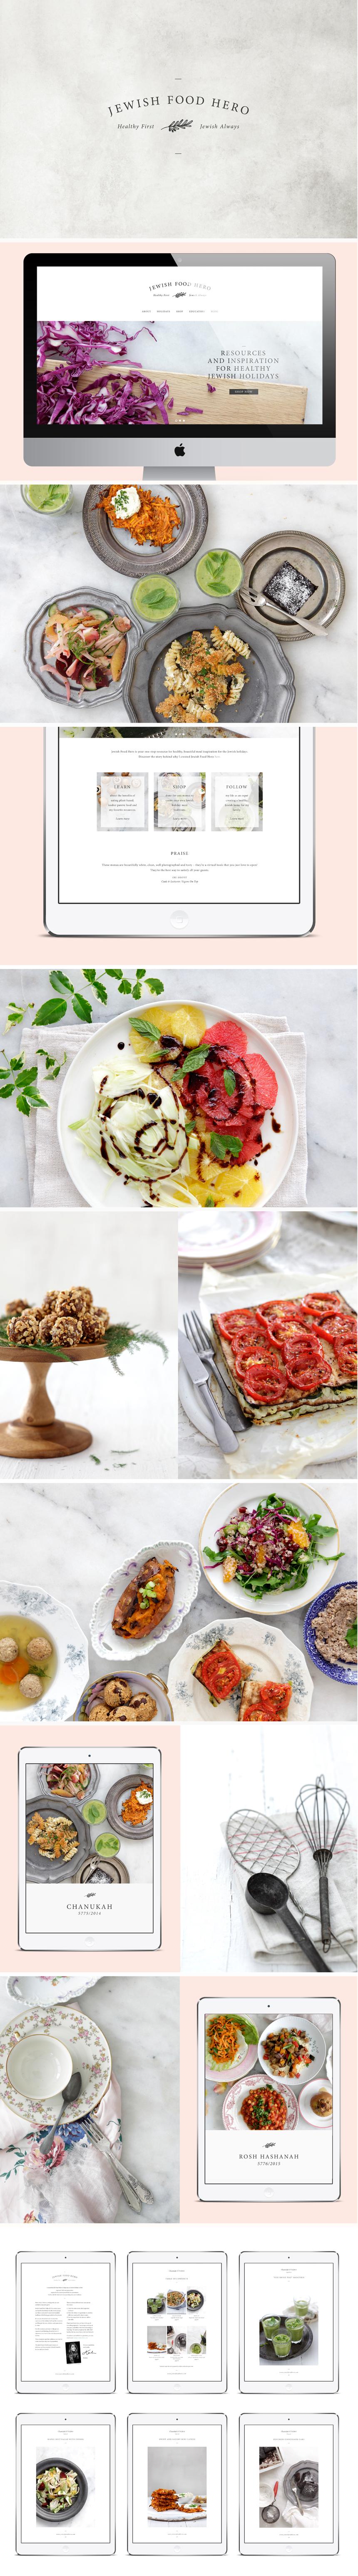 Jewish Food Hero - One Plus One Design